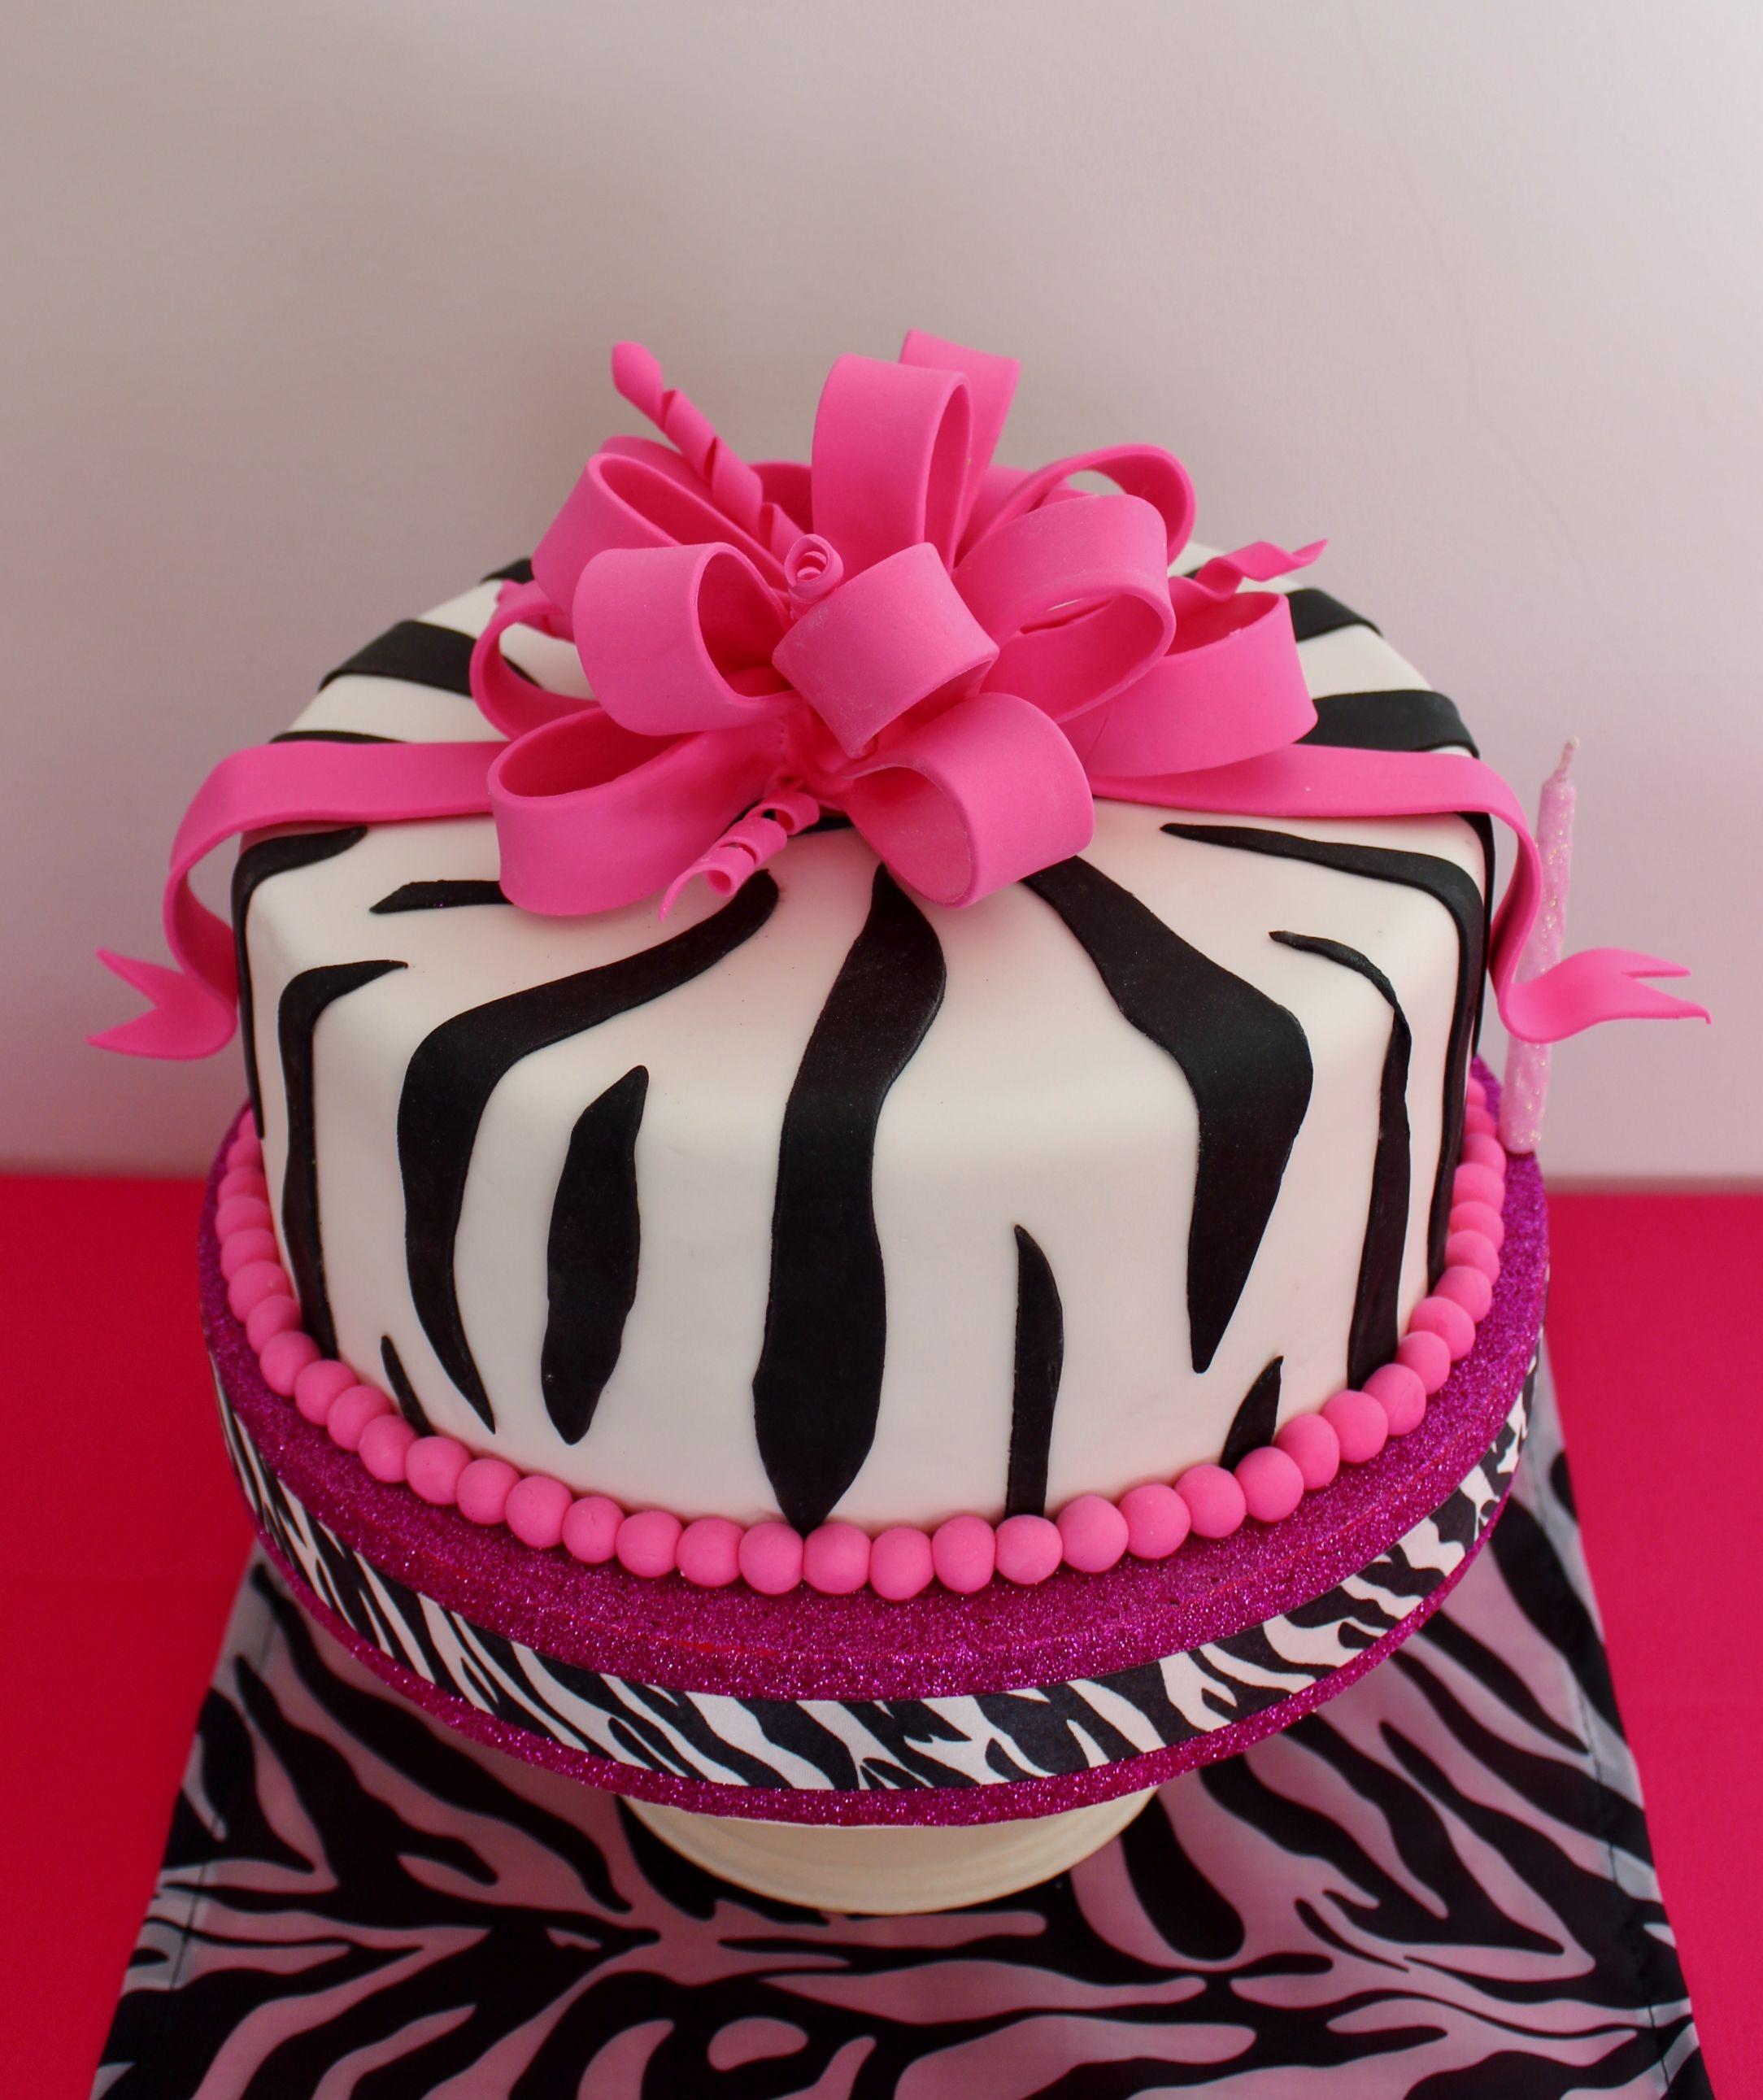 Animal Print Cake Violeta Glace | IDEAS PAR CUMPLEAÑOS | Pinterest ...